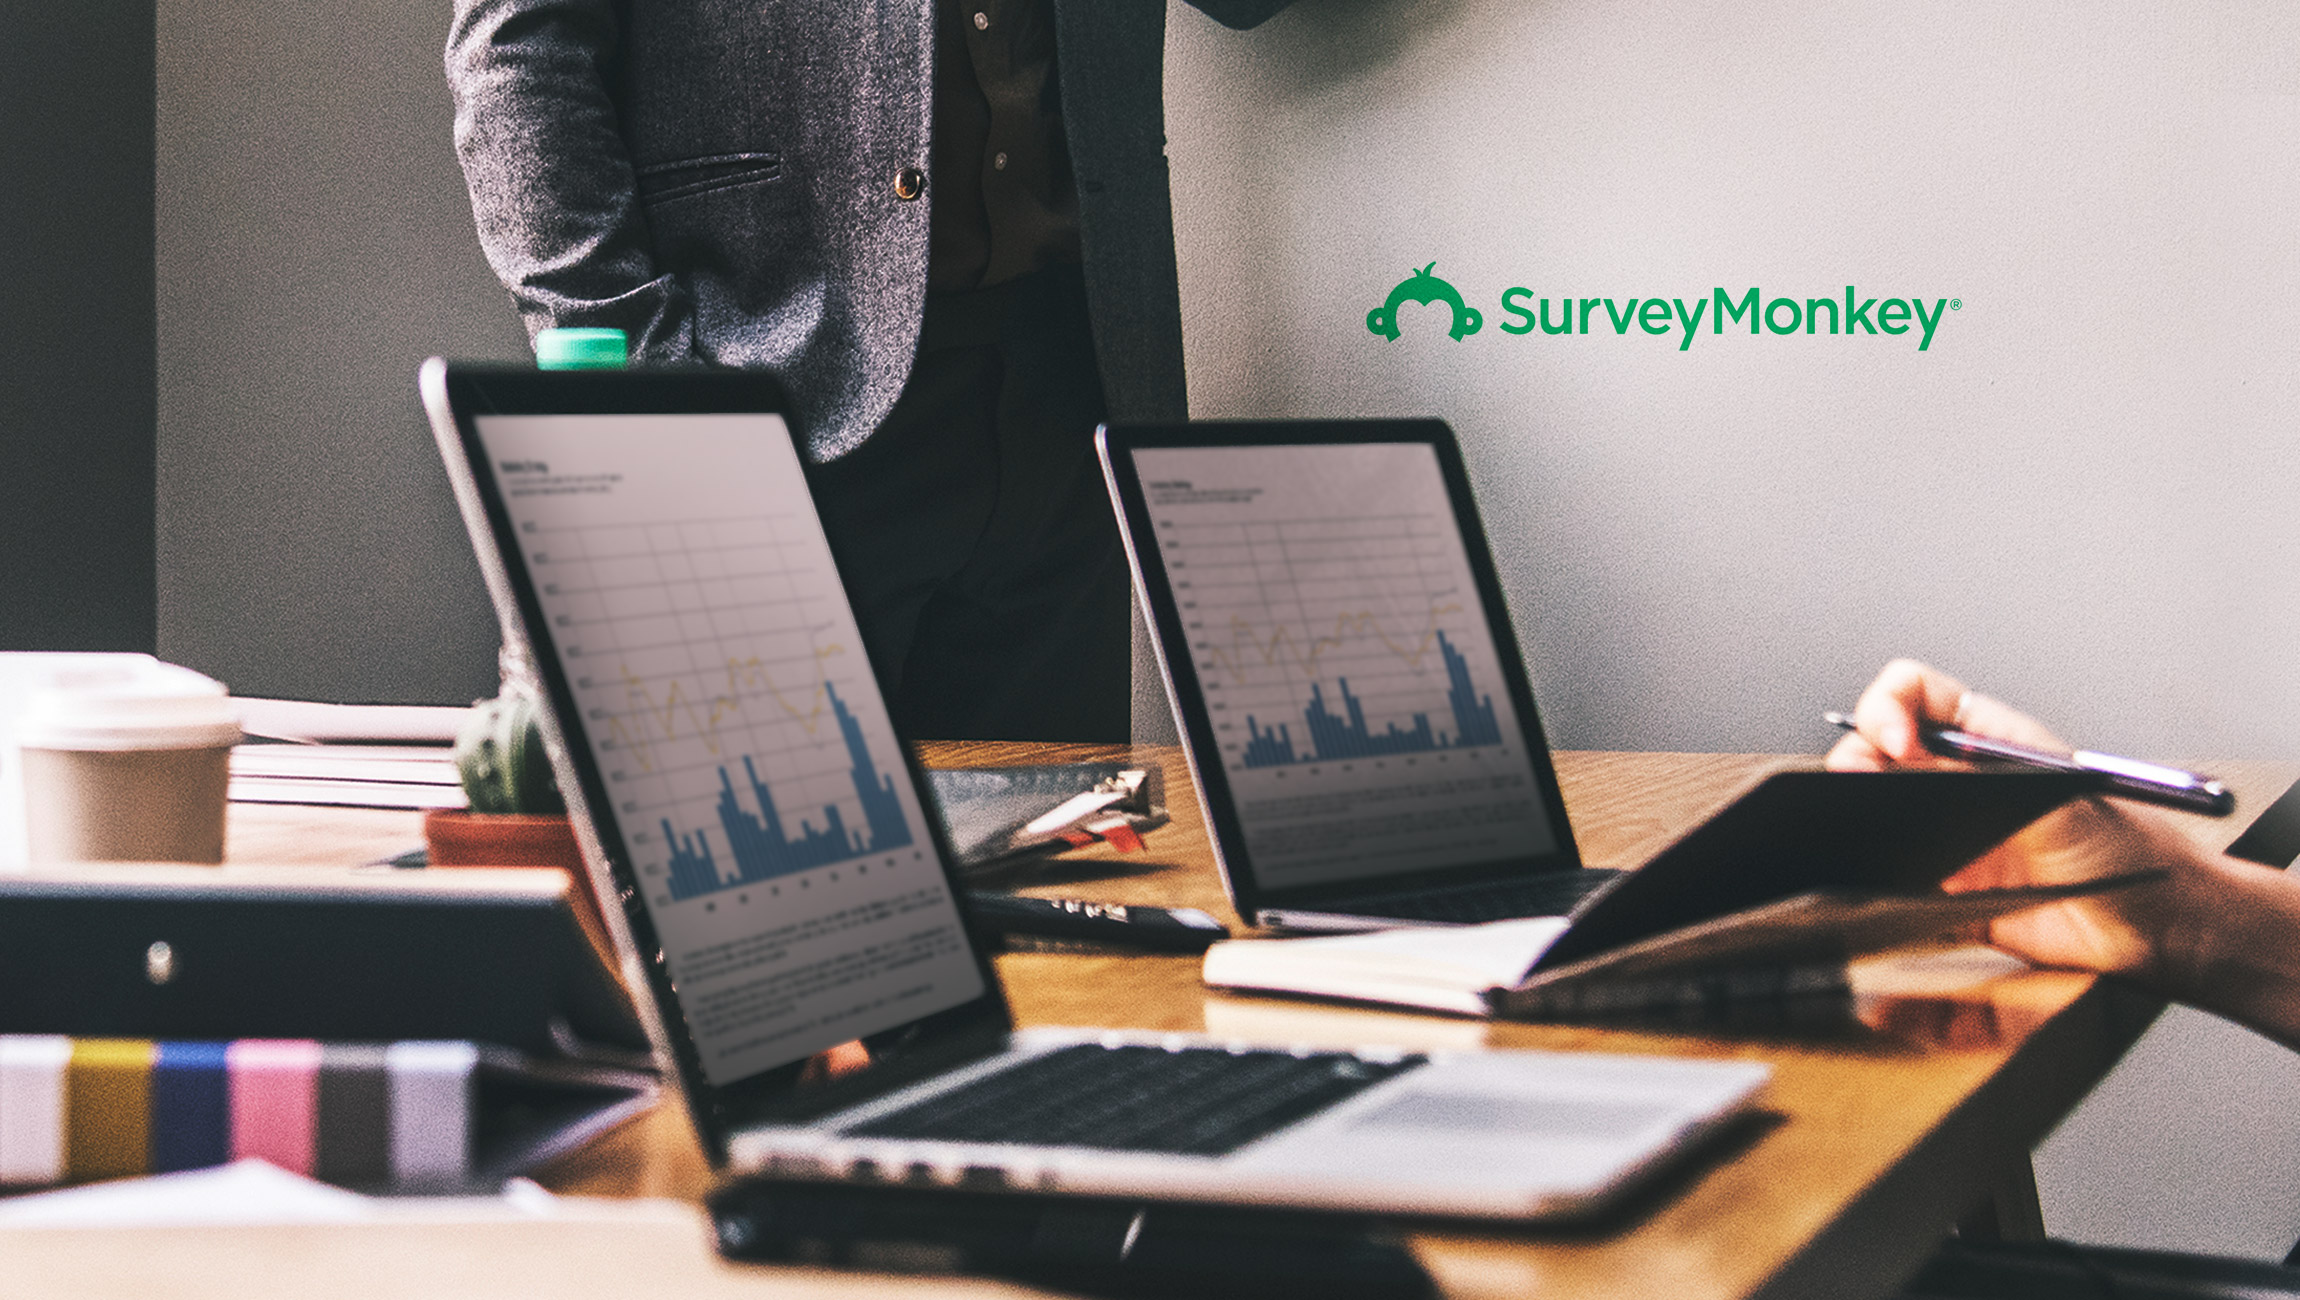 SurveyMonkey Enhances Survey Collaboration Across Organizations with Flexible Team Plans